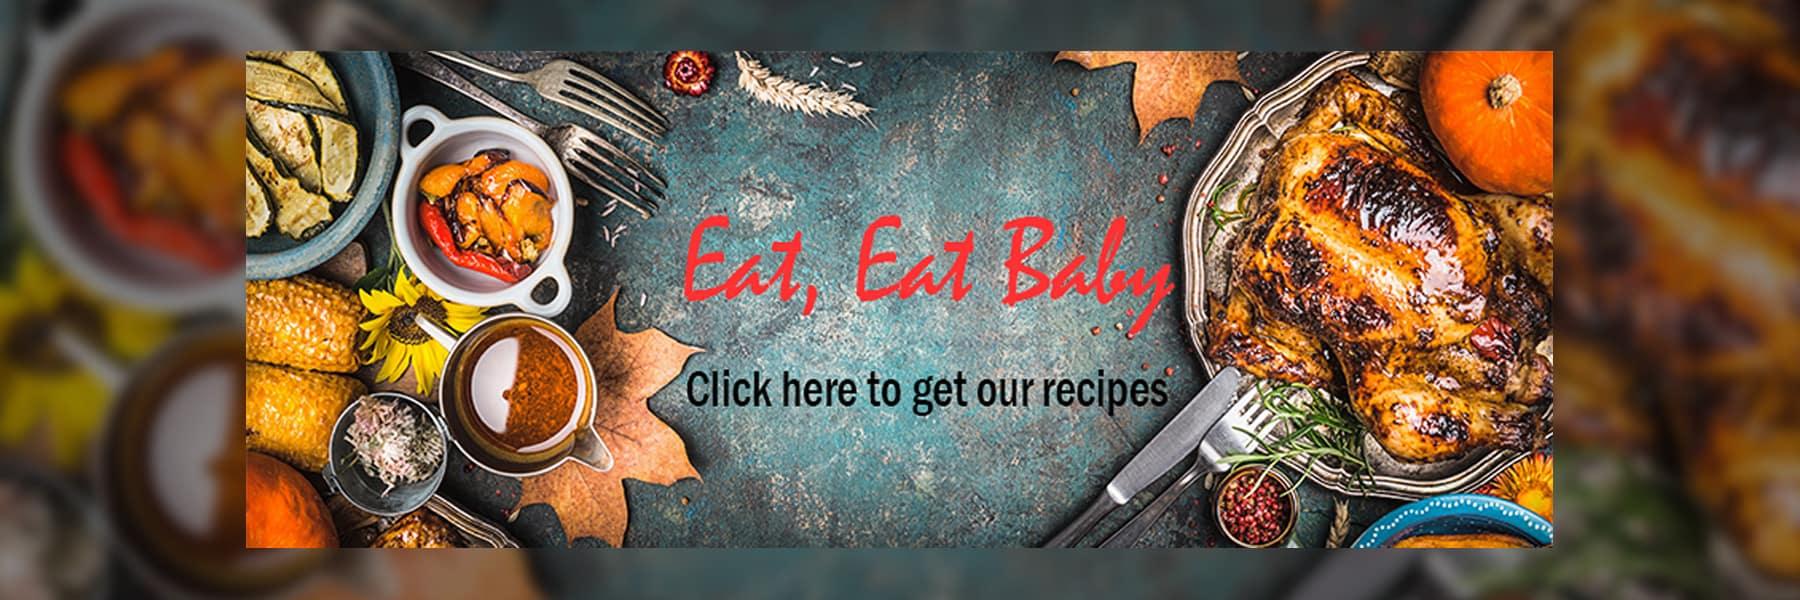 Bayer_Motors_Eat_Eat_Baby